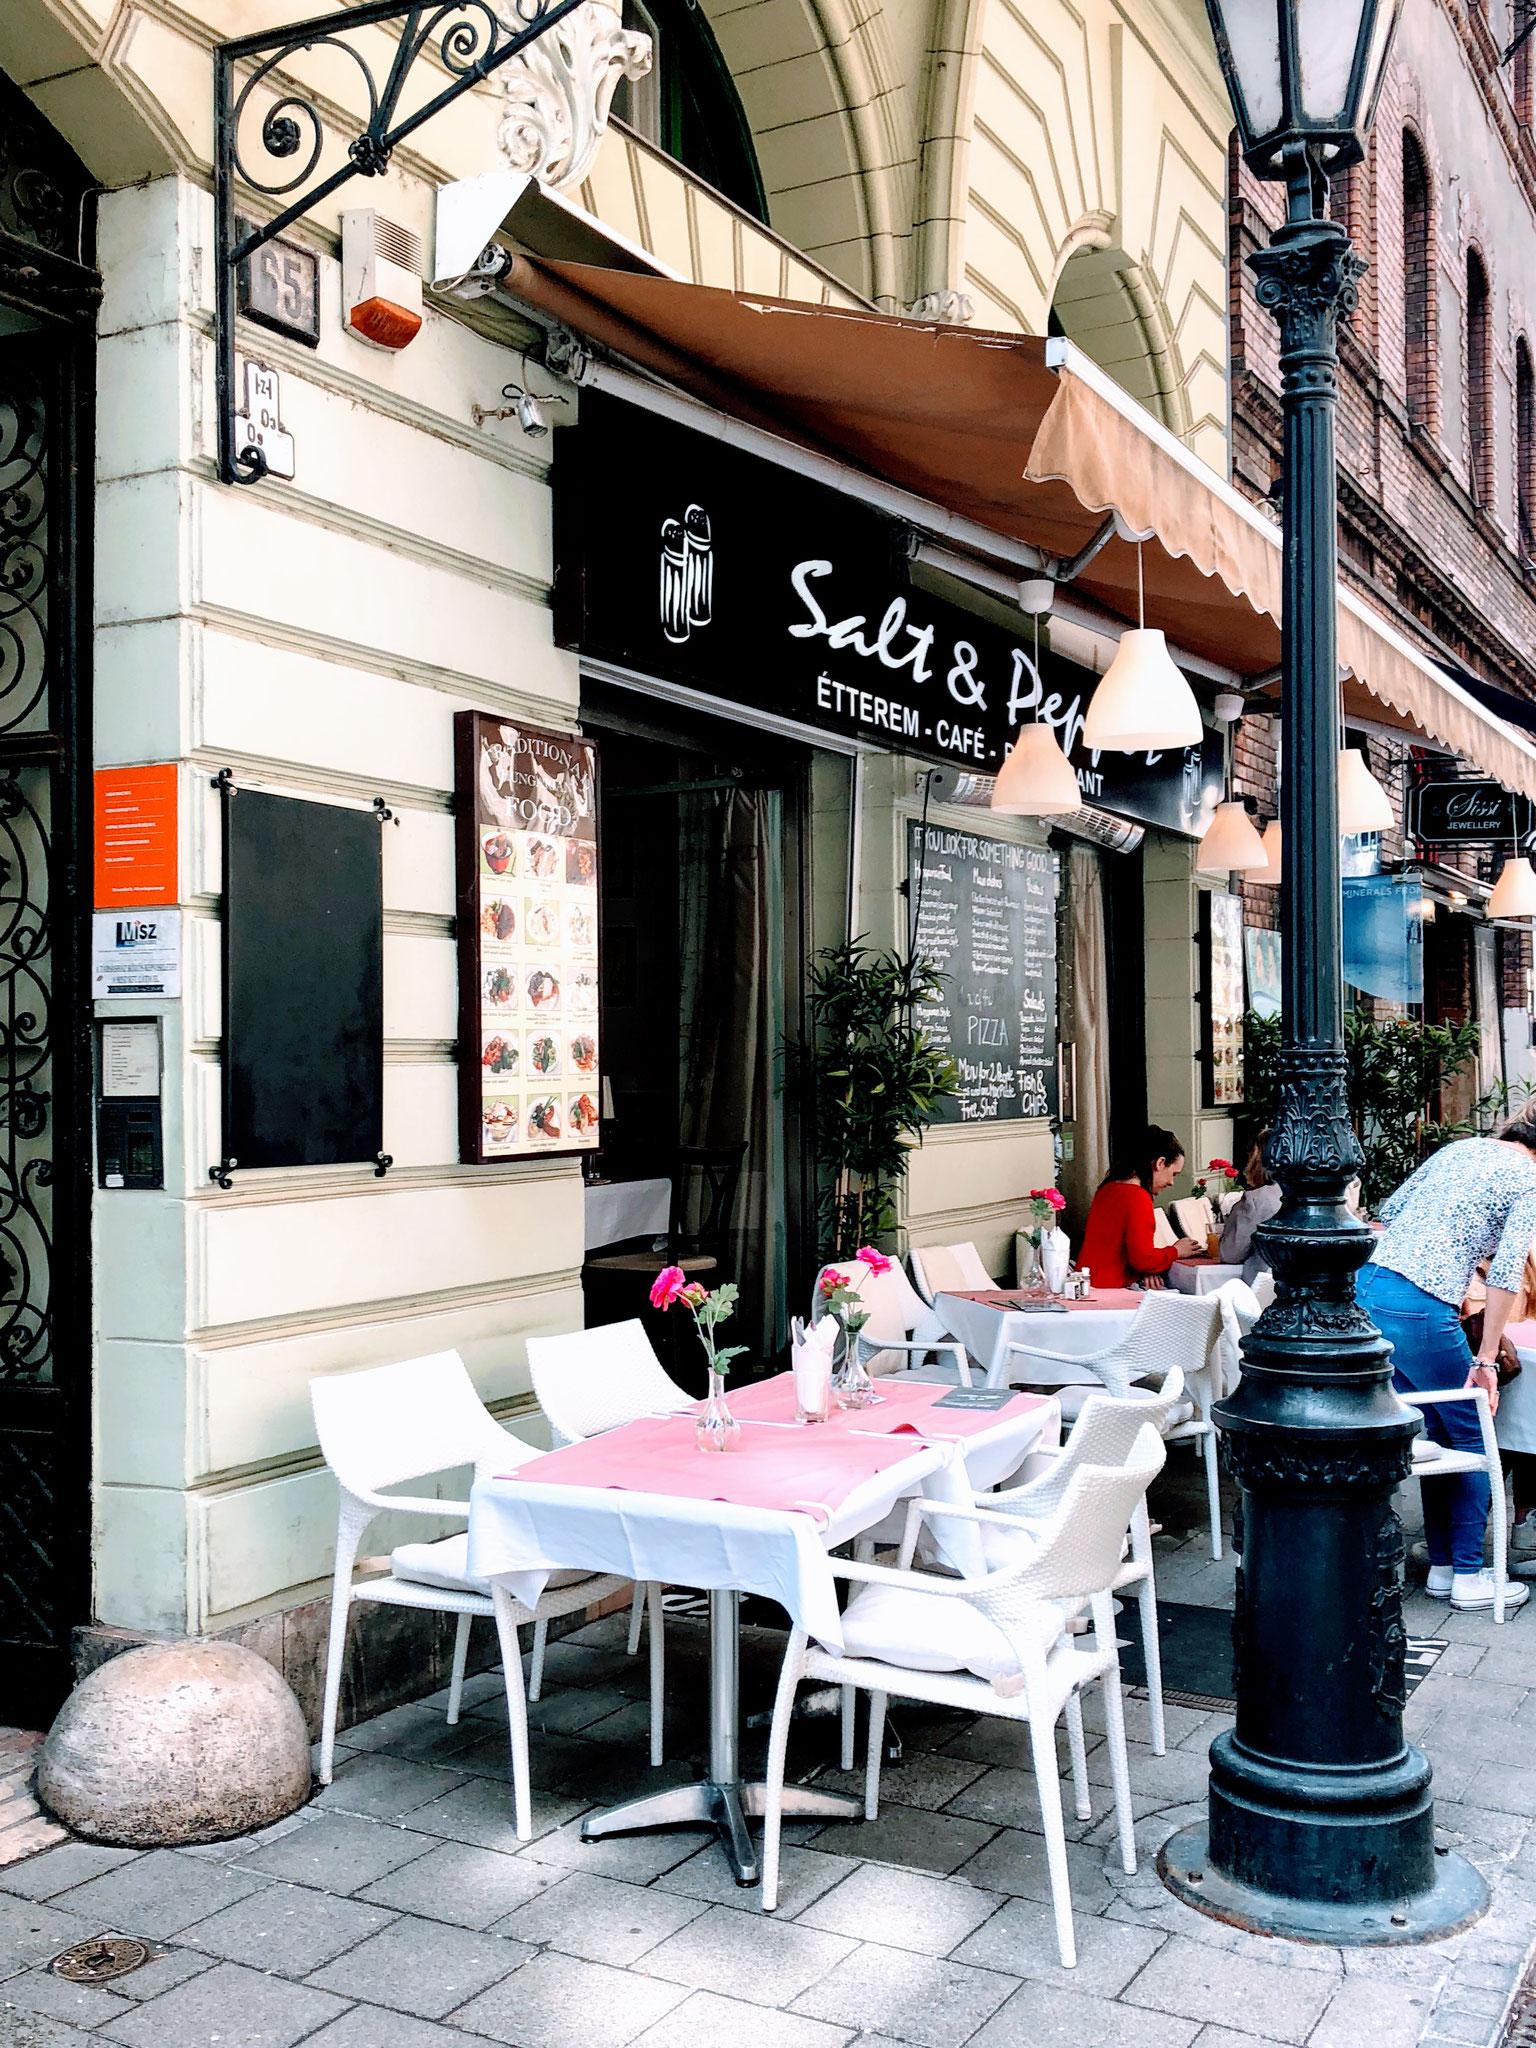 Restaurant Salt & Pepper mitten in Budapest